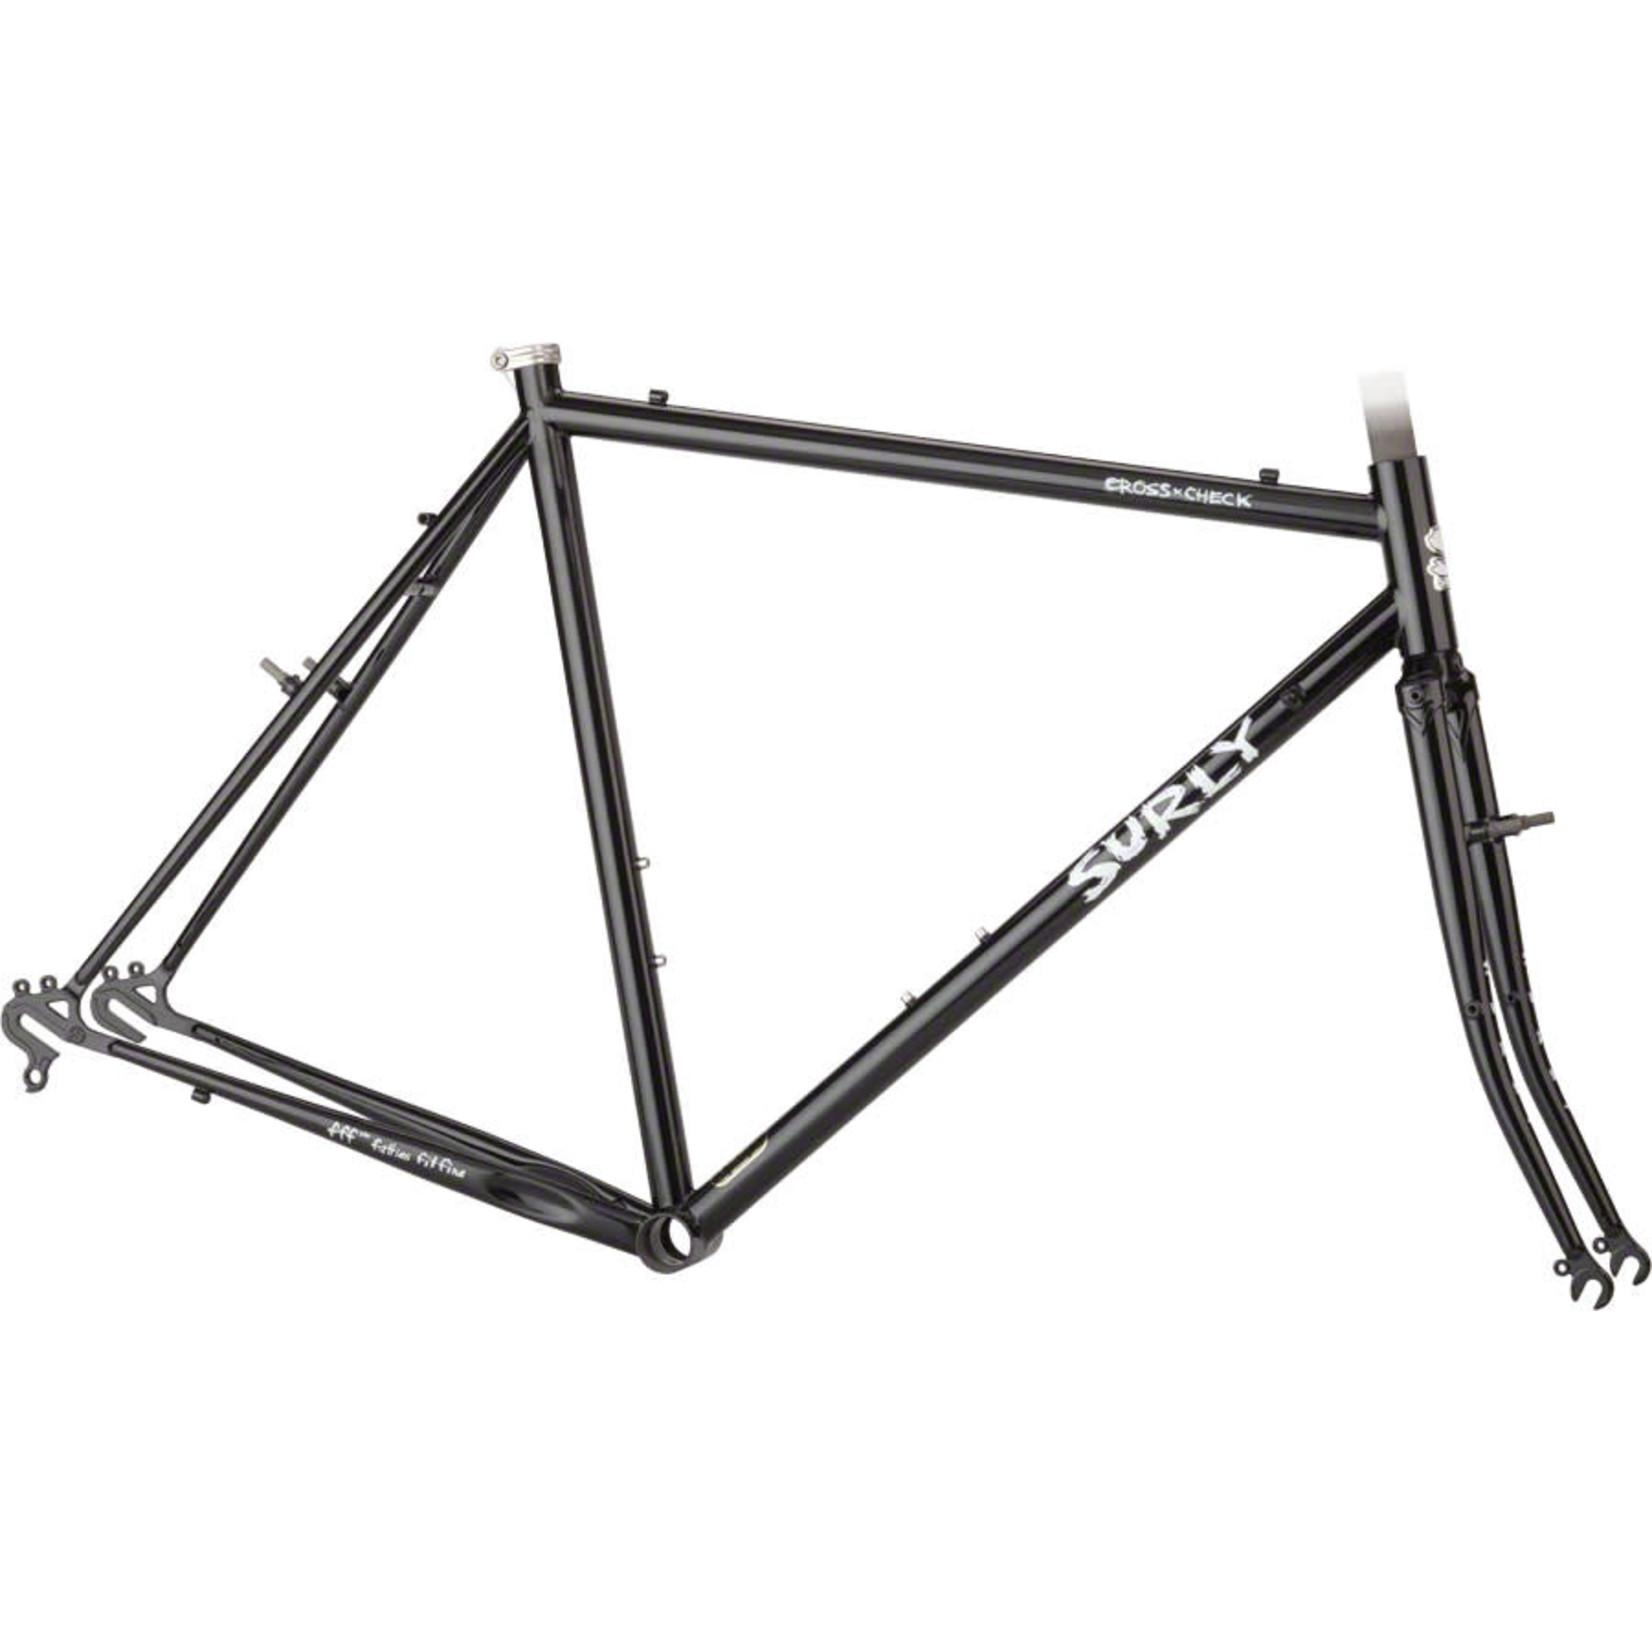 Surly Surly Cross Check 52cm Frameset Gloss Black